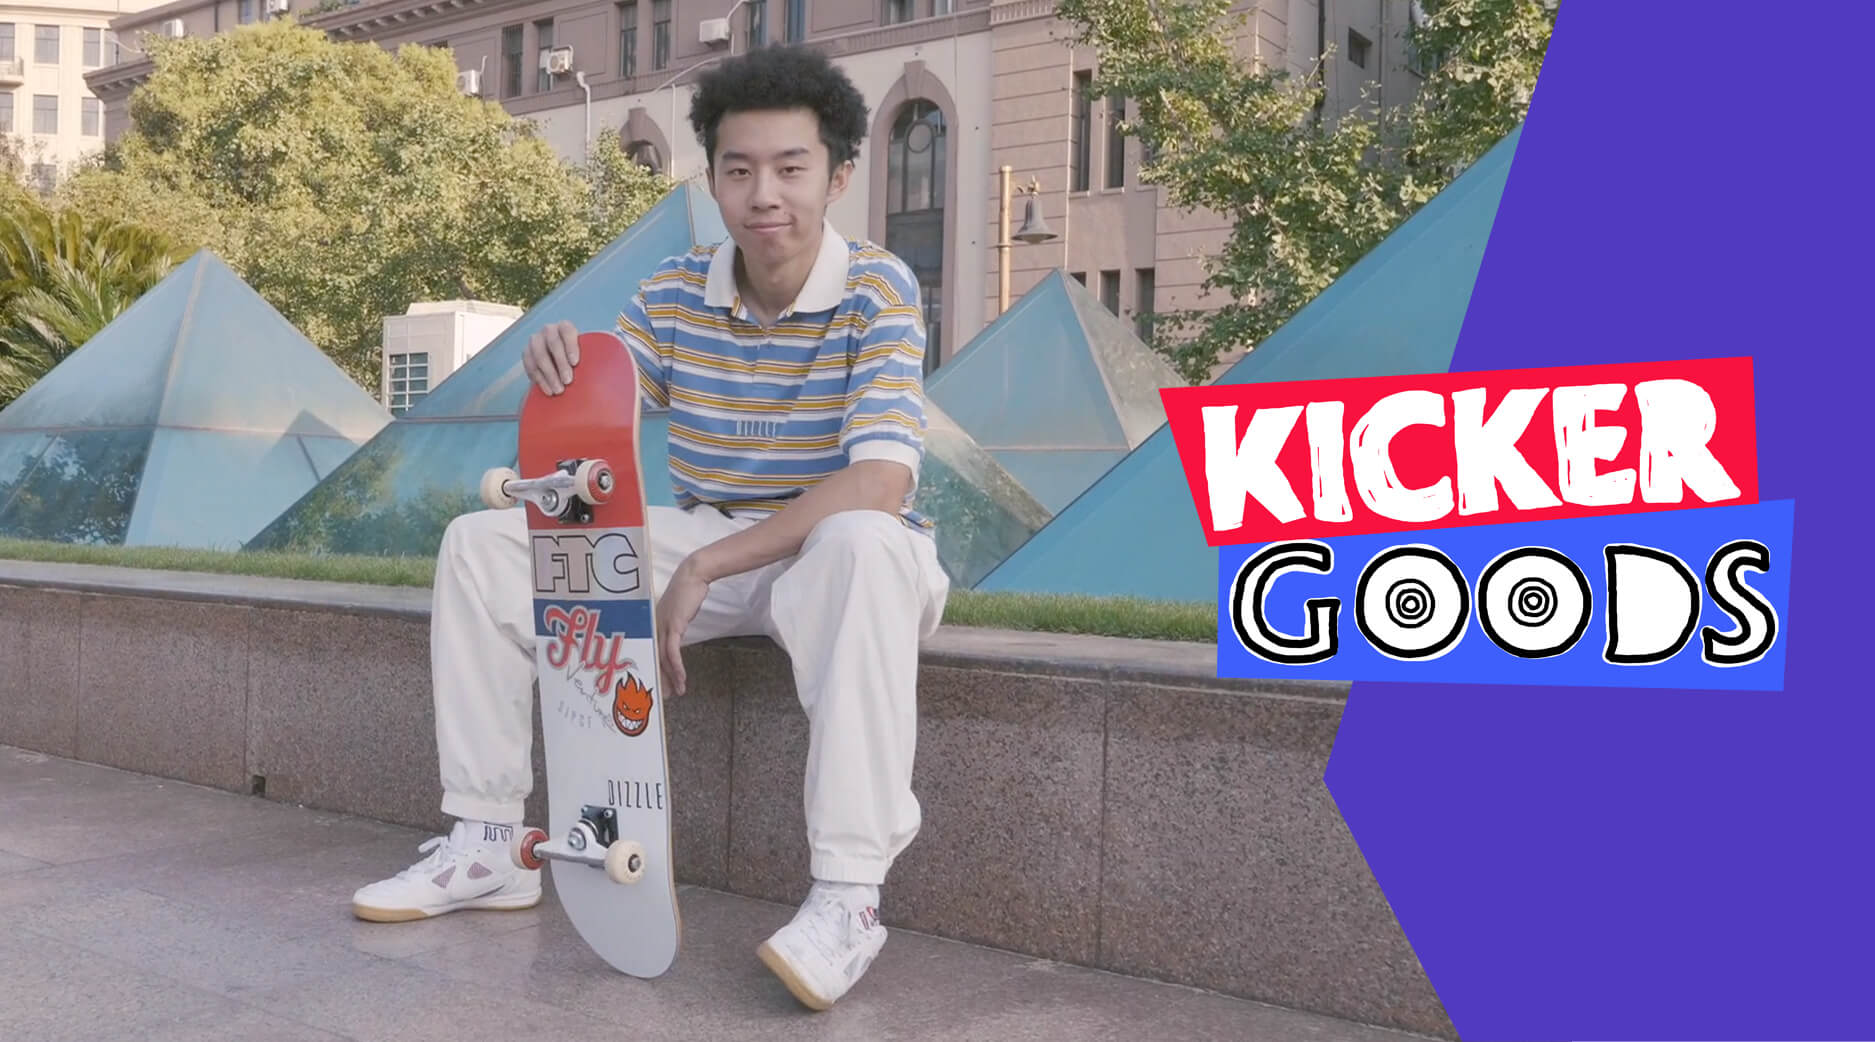 KickerGoods6 – 王玓对滑板的要求到底有多细致?